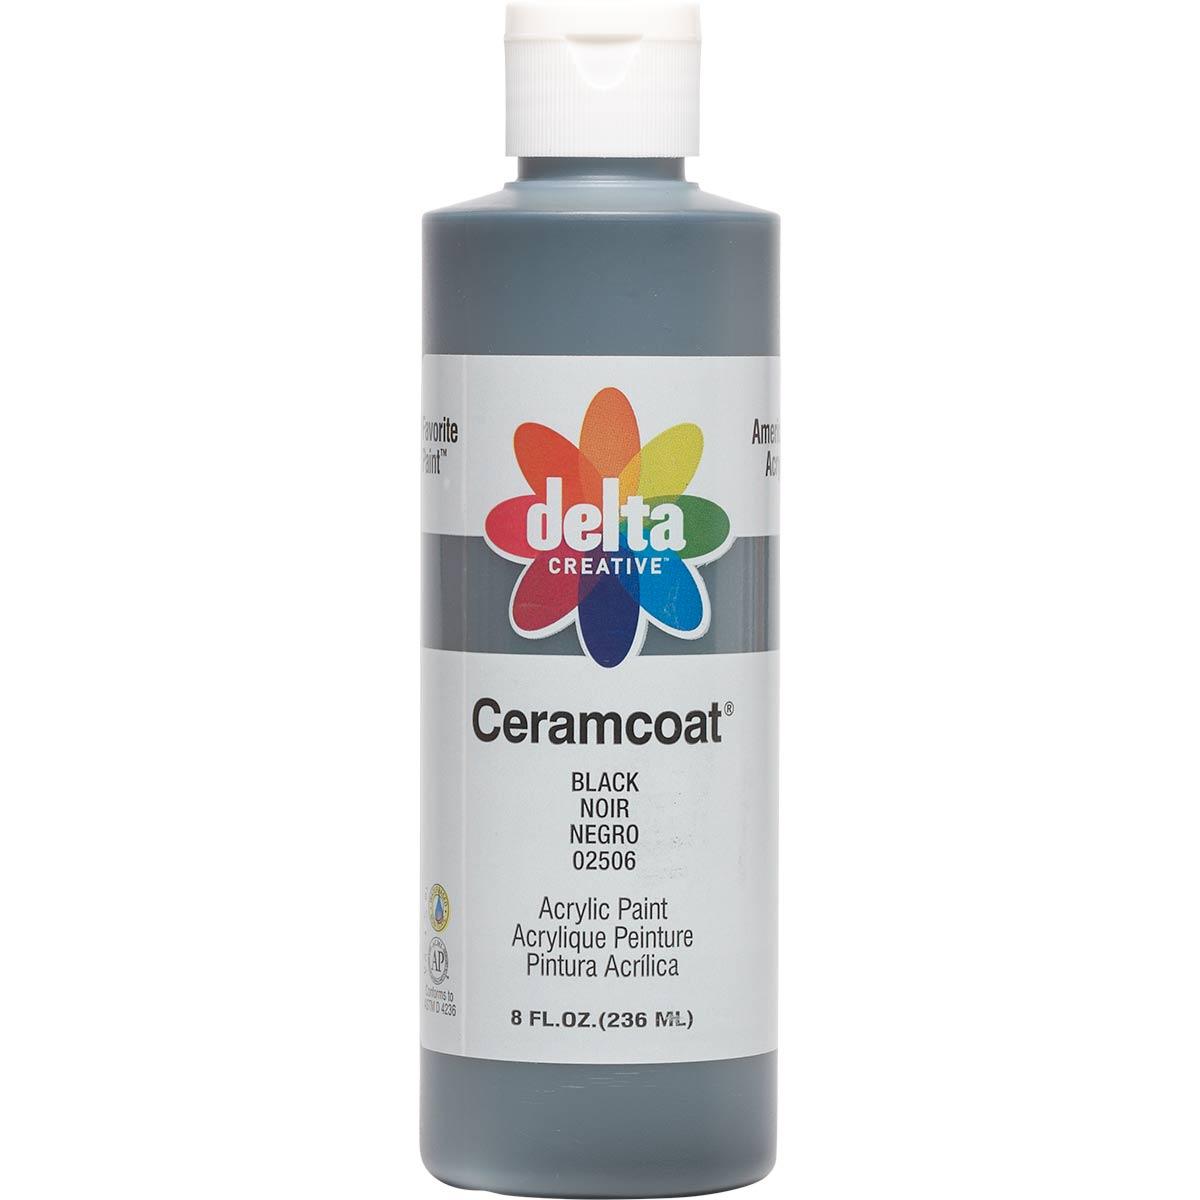 Delta Ceramcoat ® Acrylic Paint - Black, 8 oz. - 025060802W